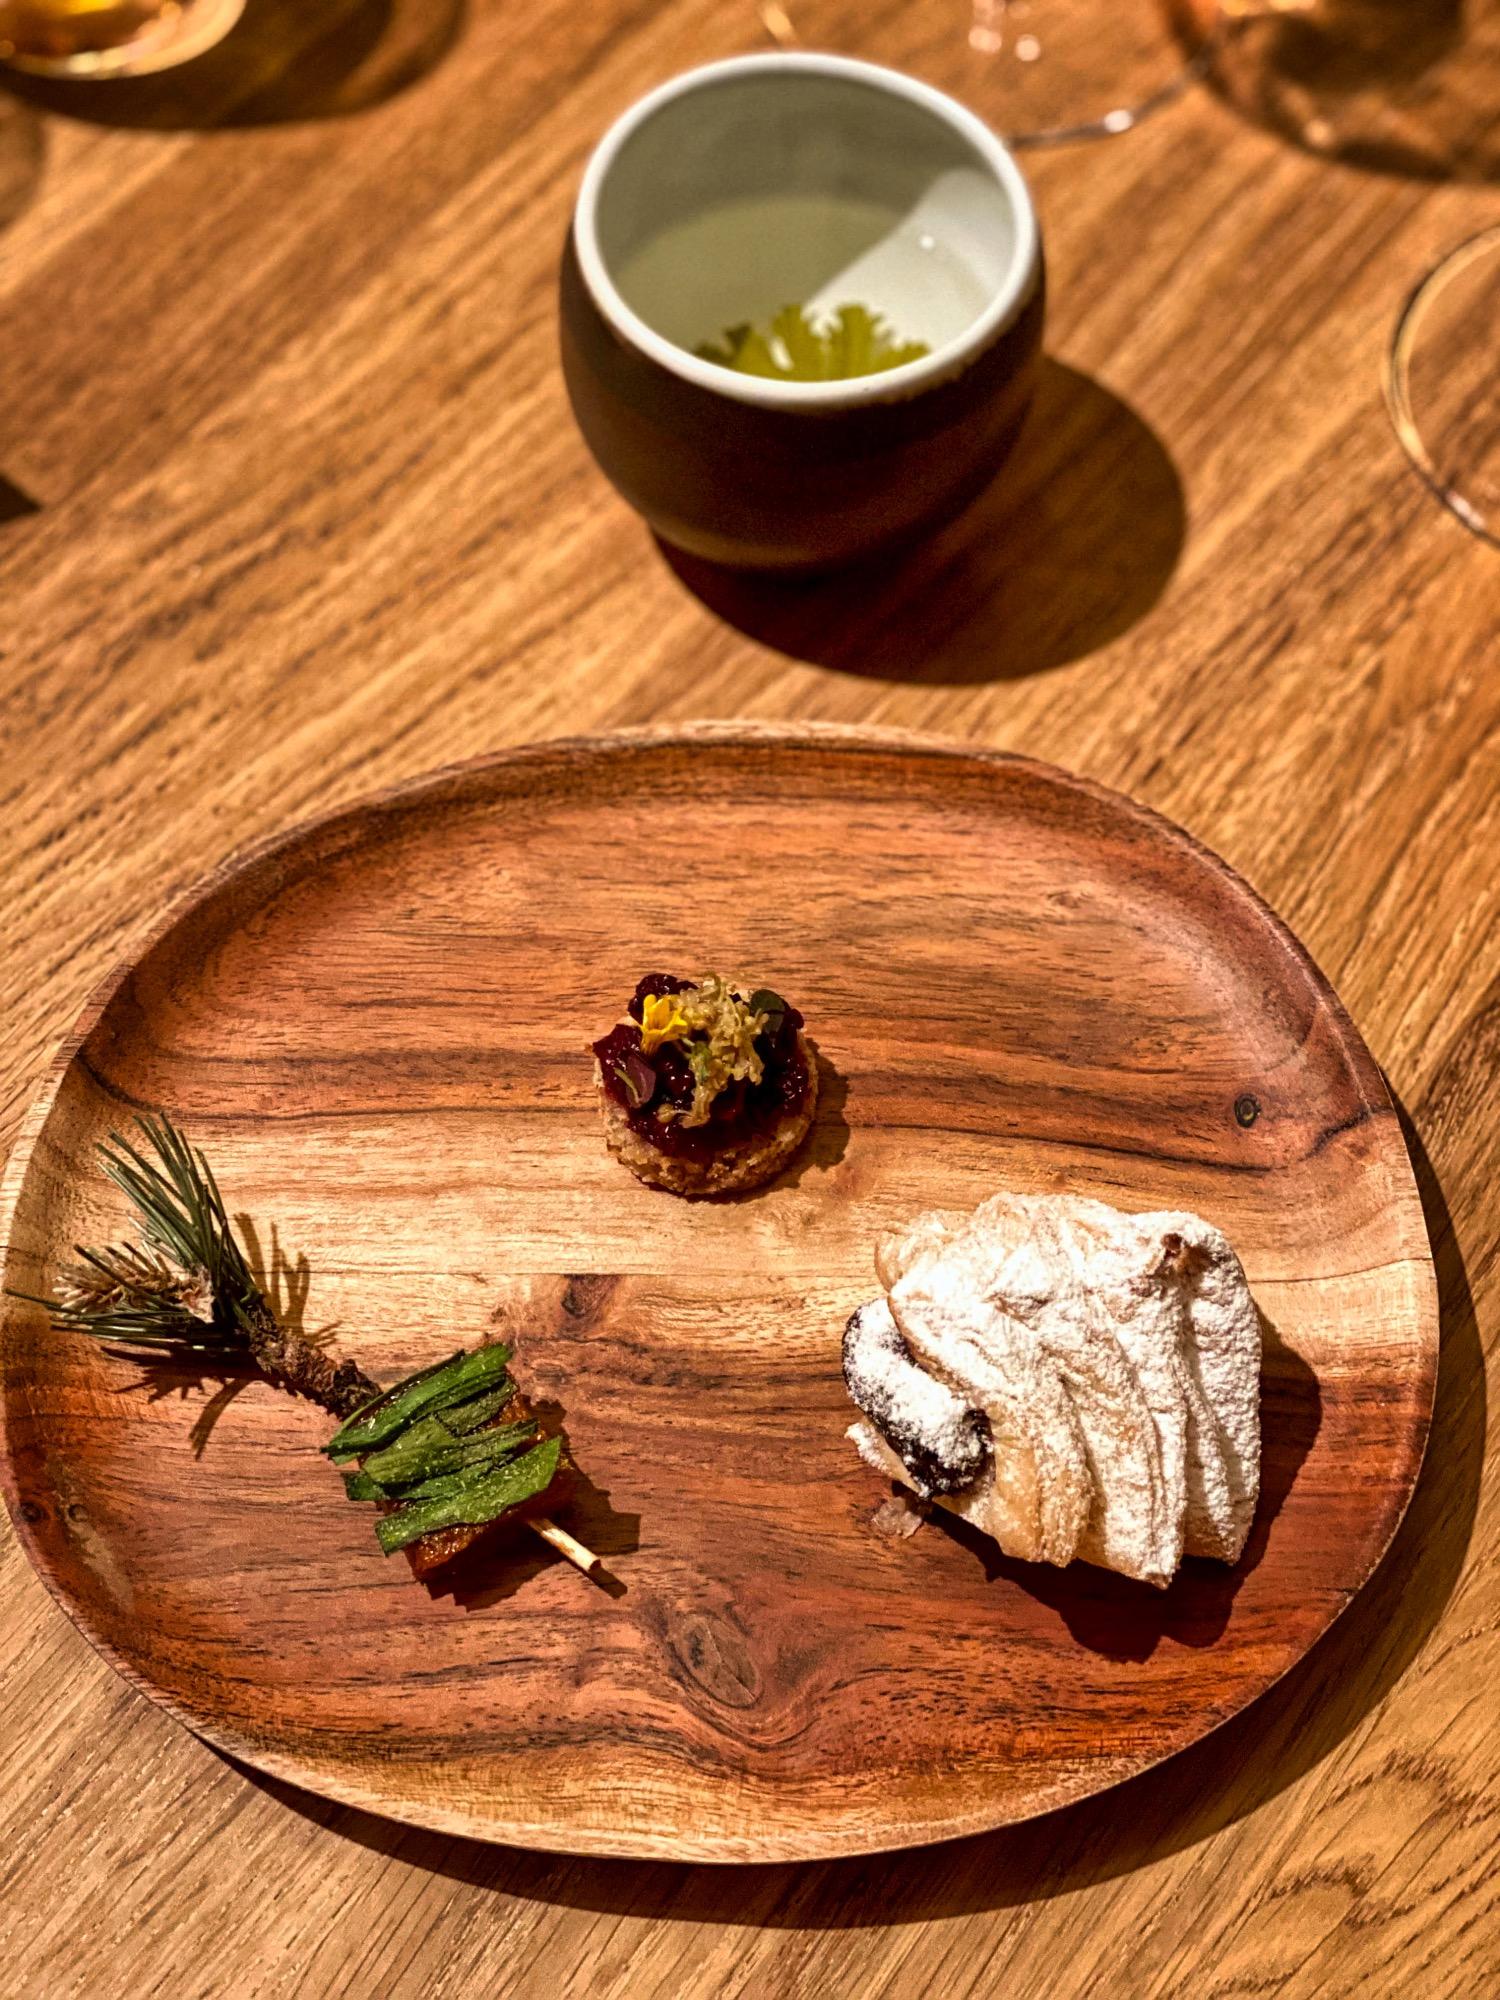 img_5984_salt_budapest_restaurant_jokuti_vilagevo.jpeg